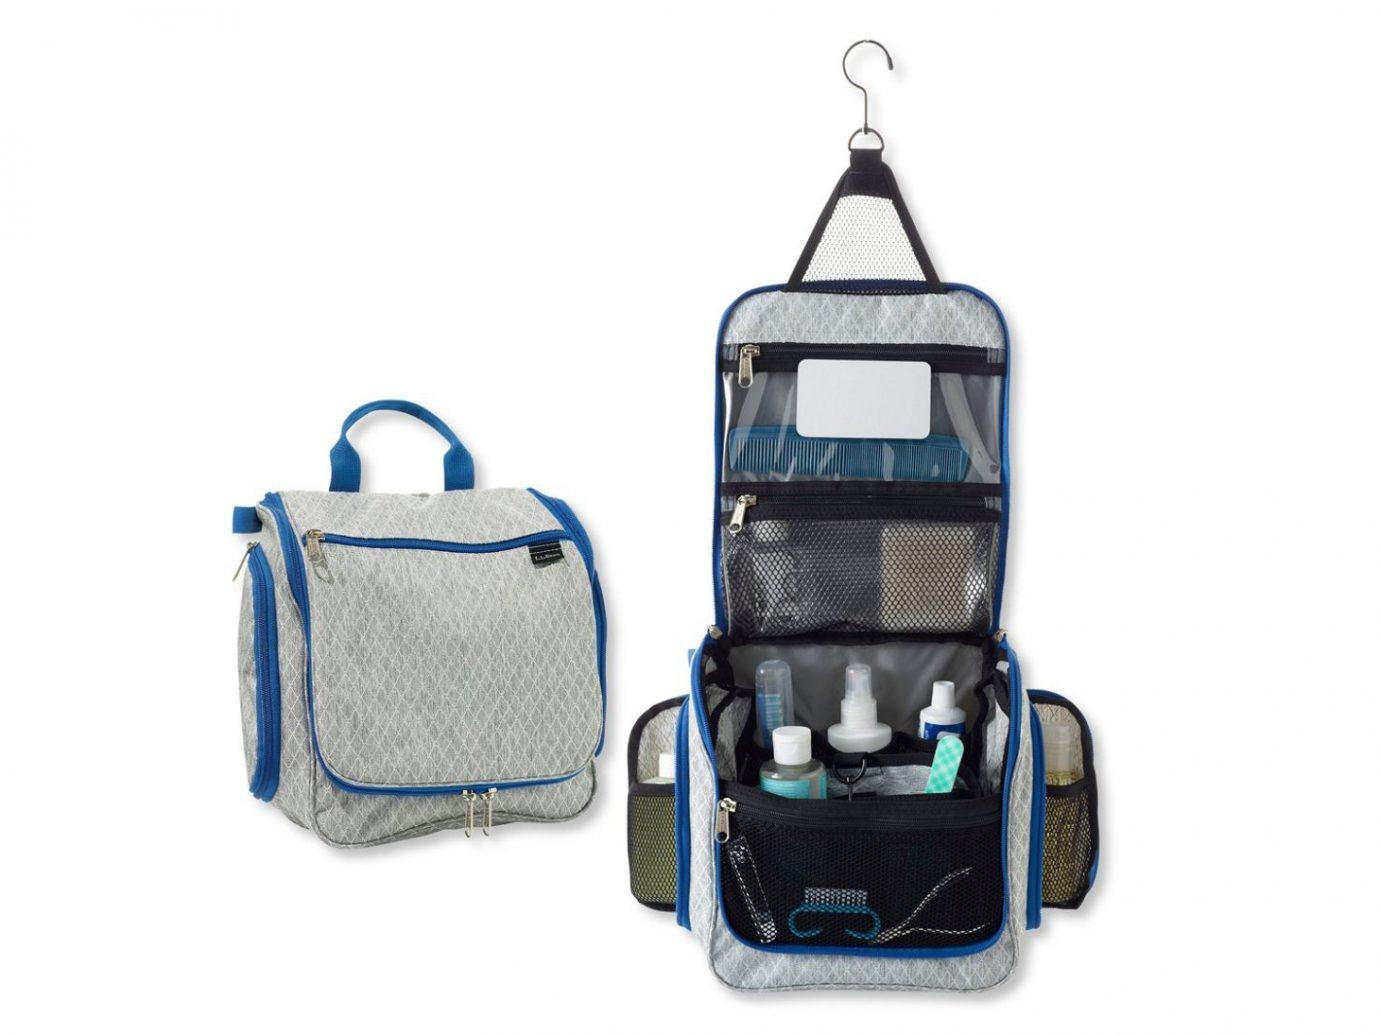 L.L.Bean Personal Organizer Toiletry Bag, Medium